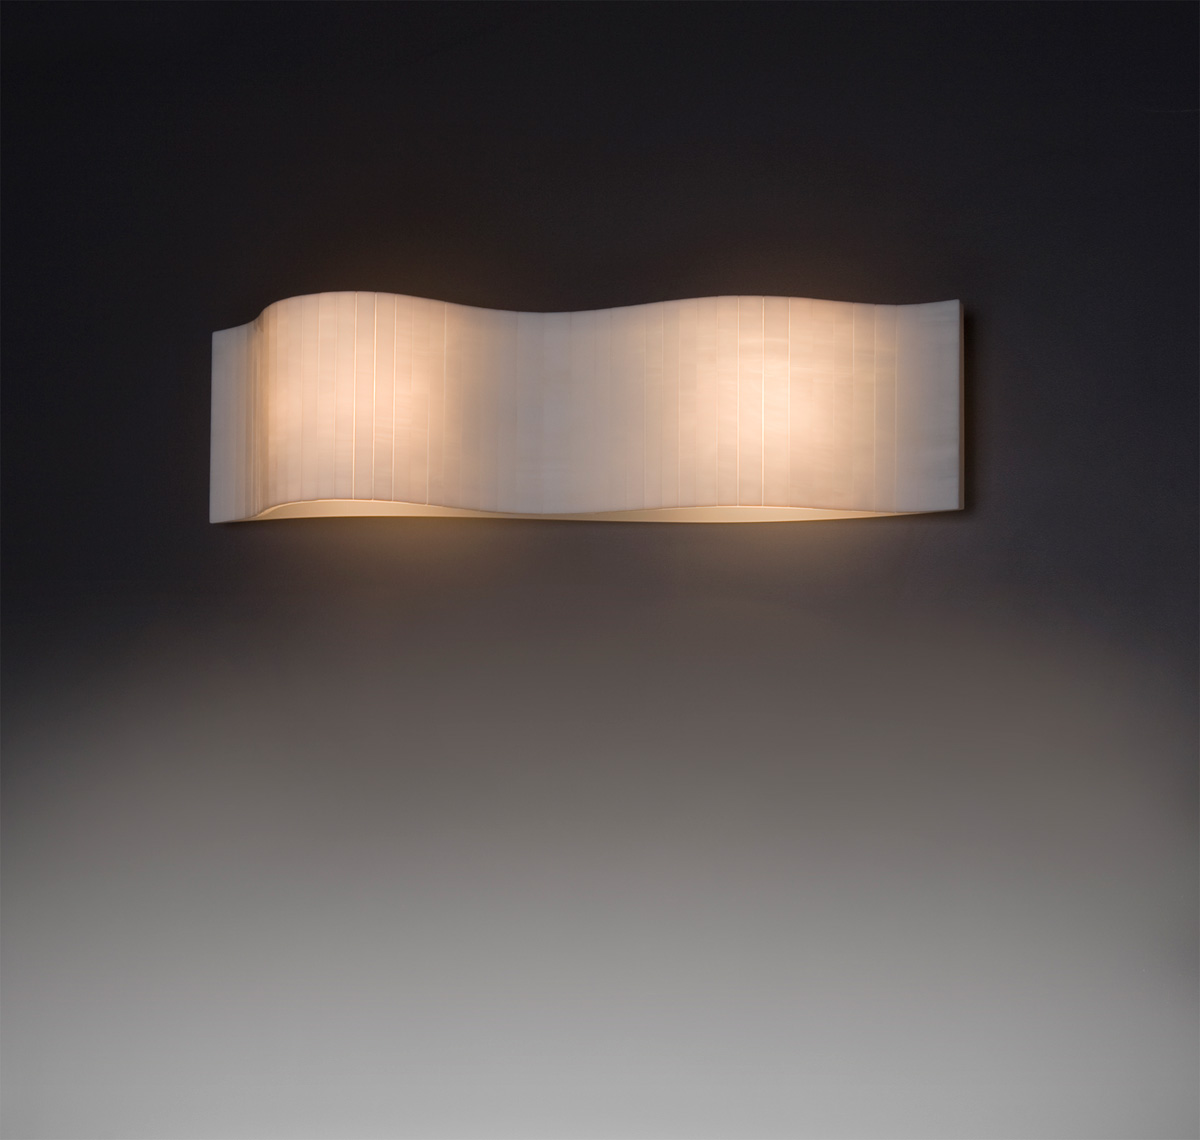 Vento Wall Lamp 22,8x5,9cm G9